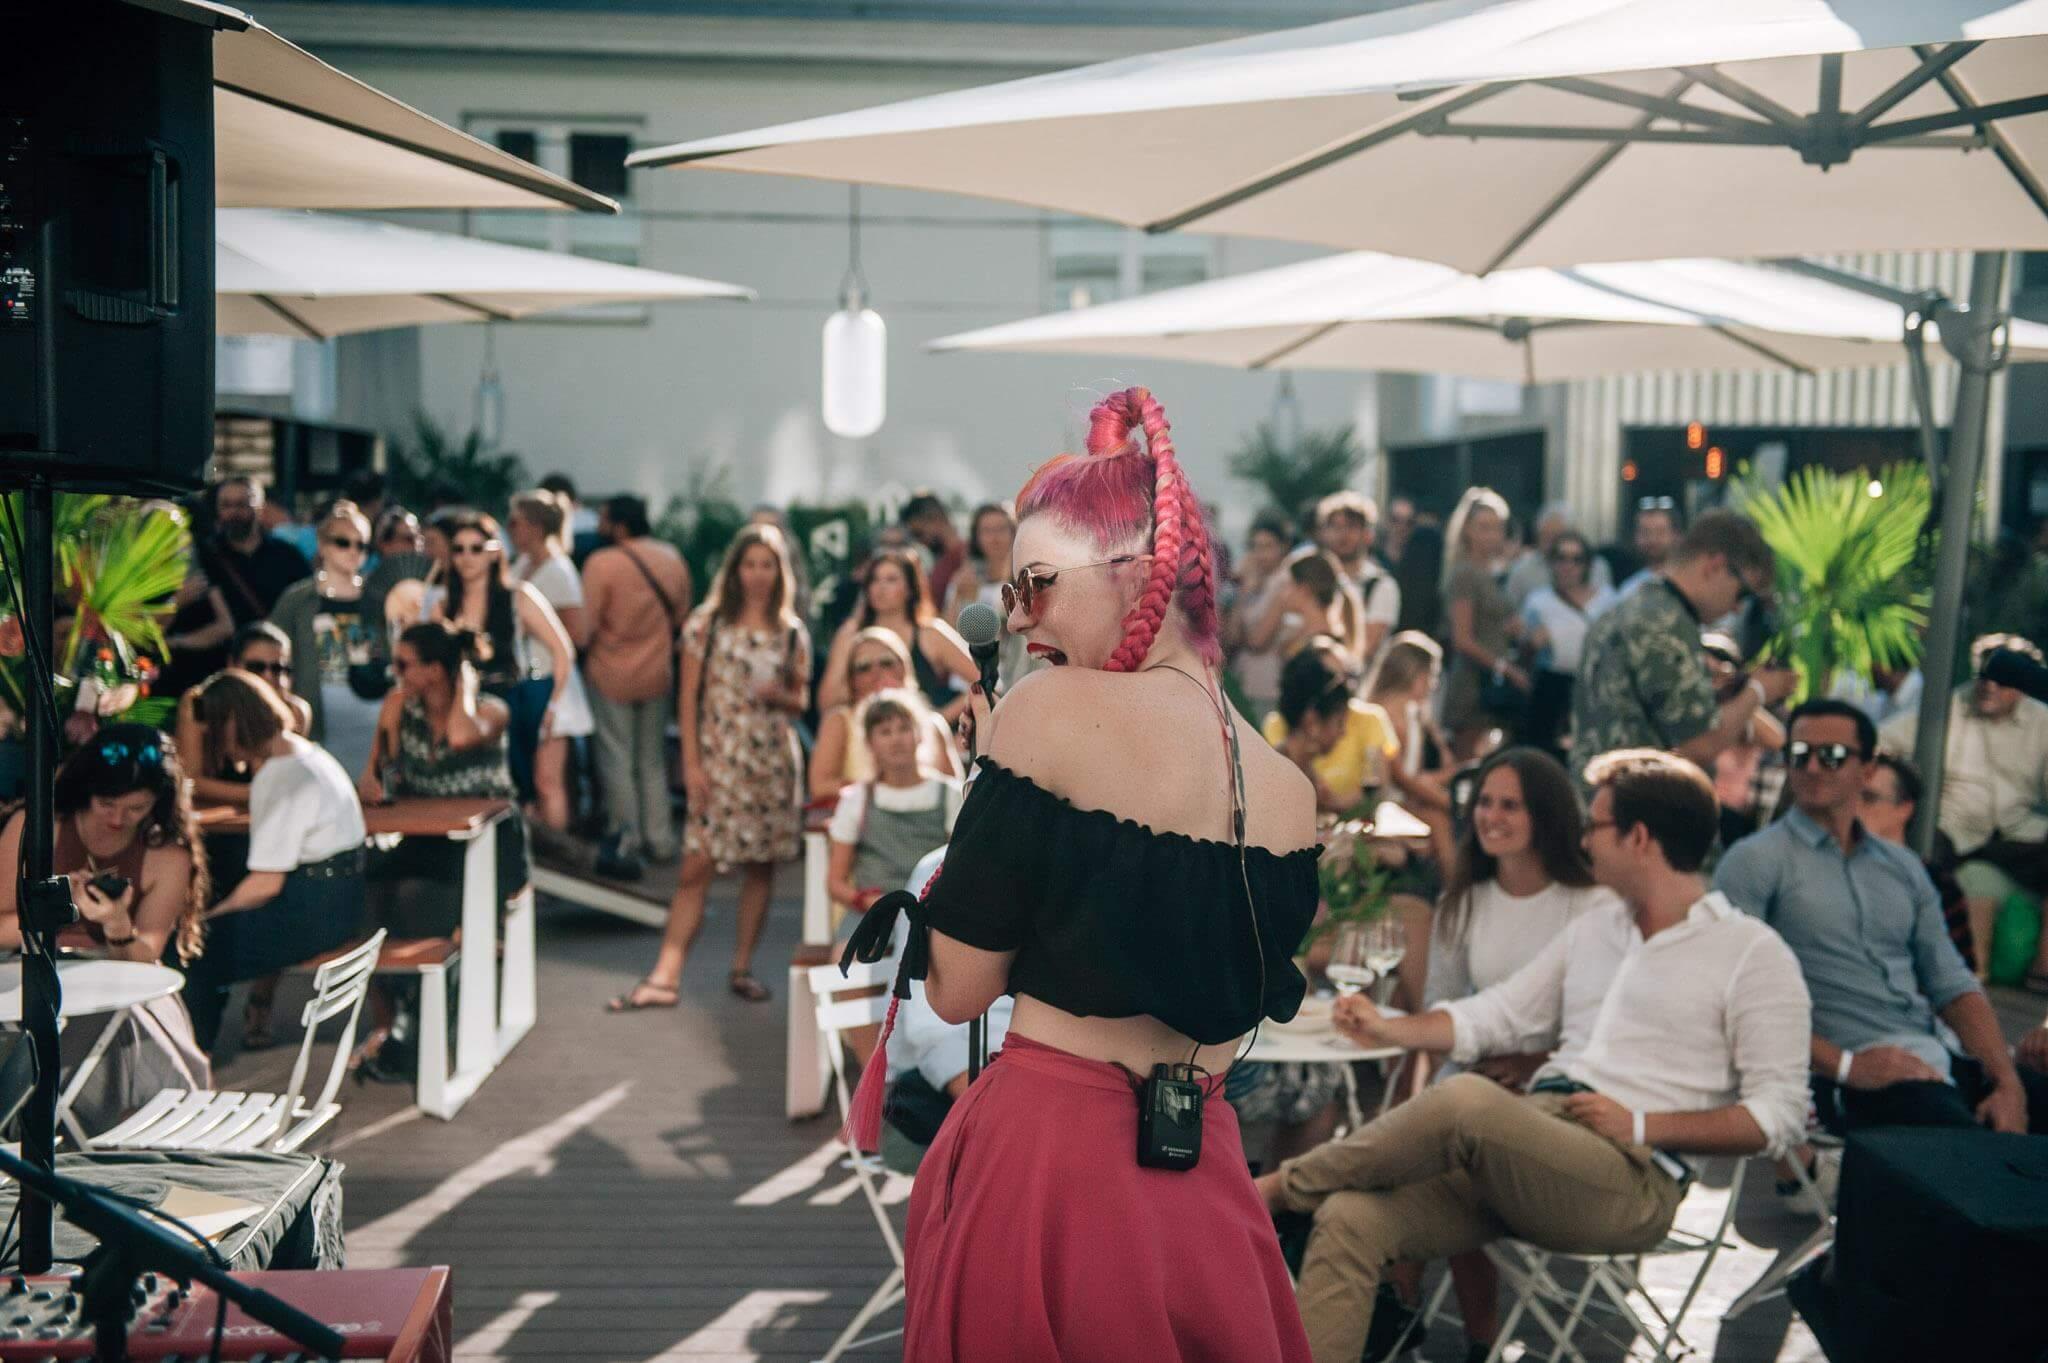 Make your next event a unique experience